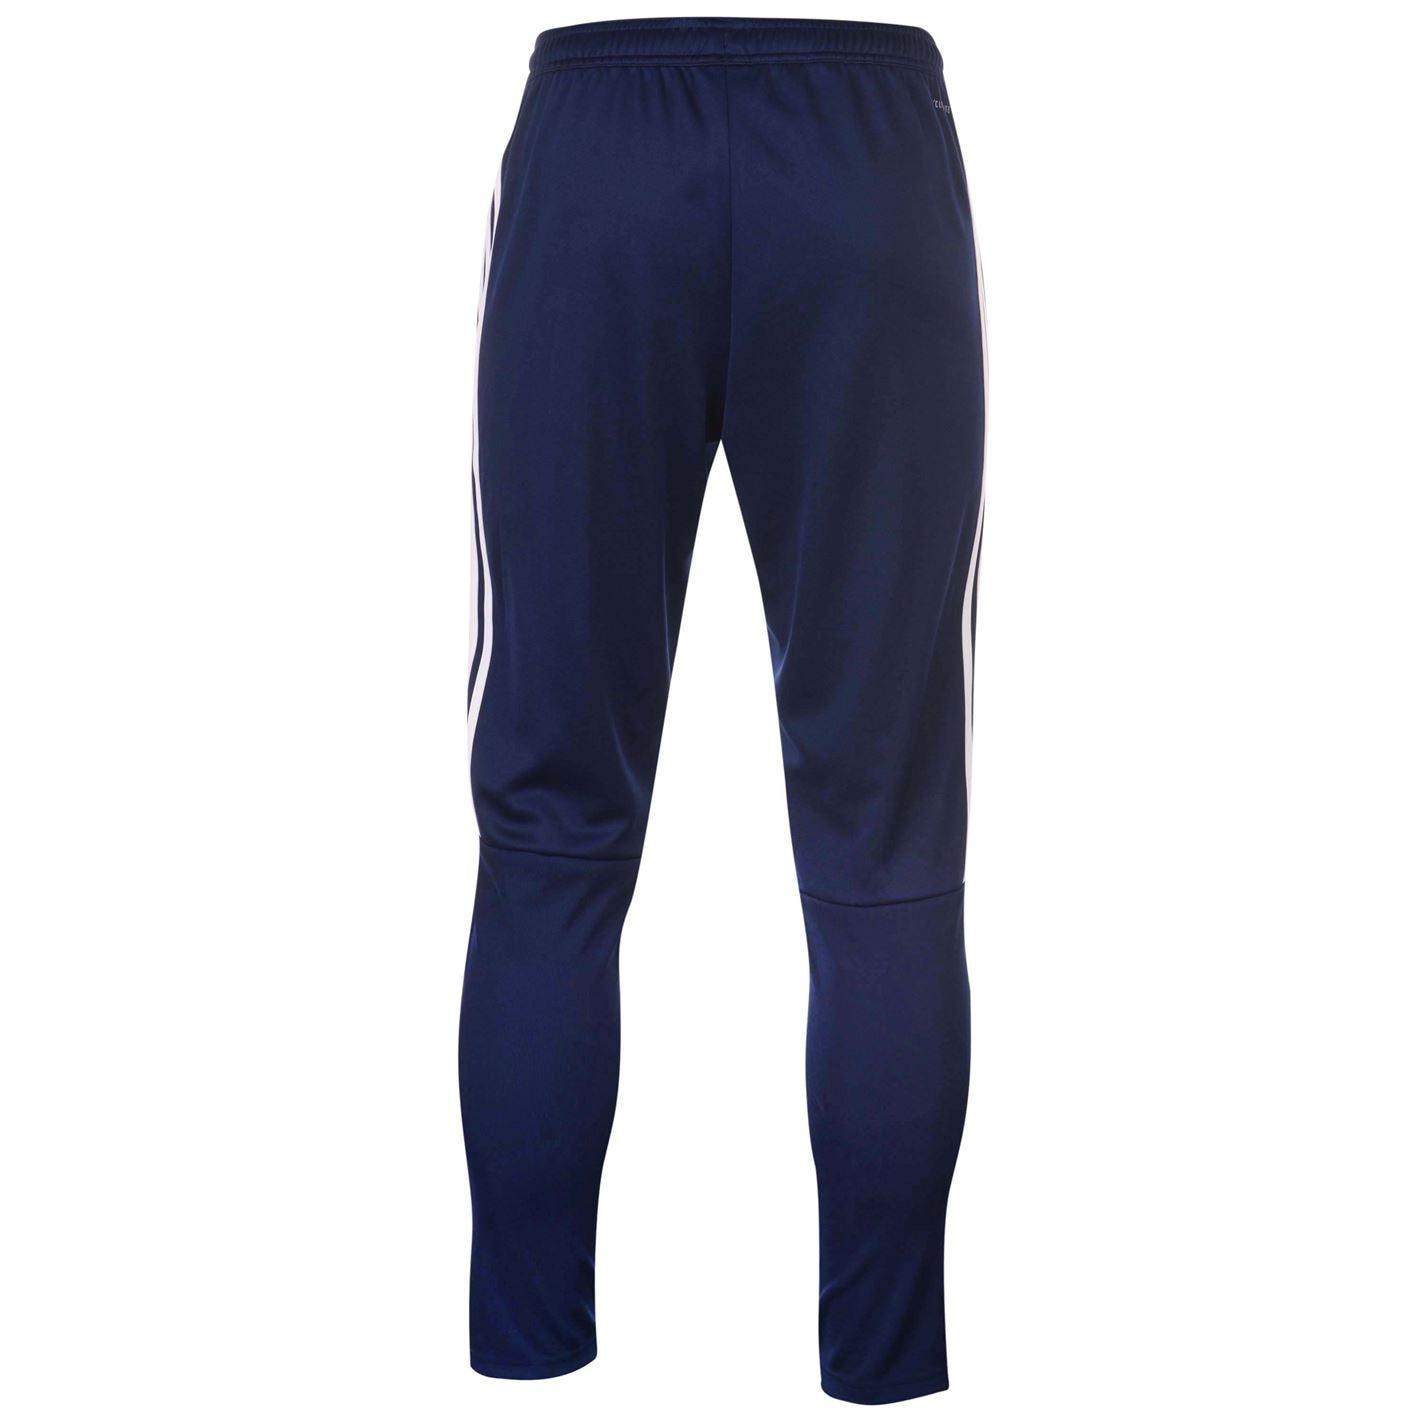 Pantaloni adidas fotbal Sereno 19 Slim bleumarin